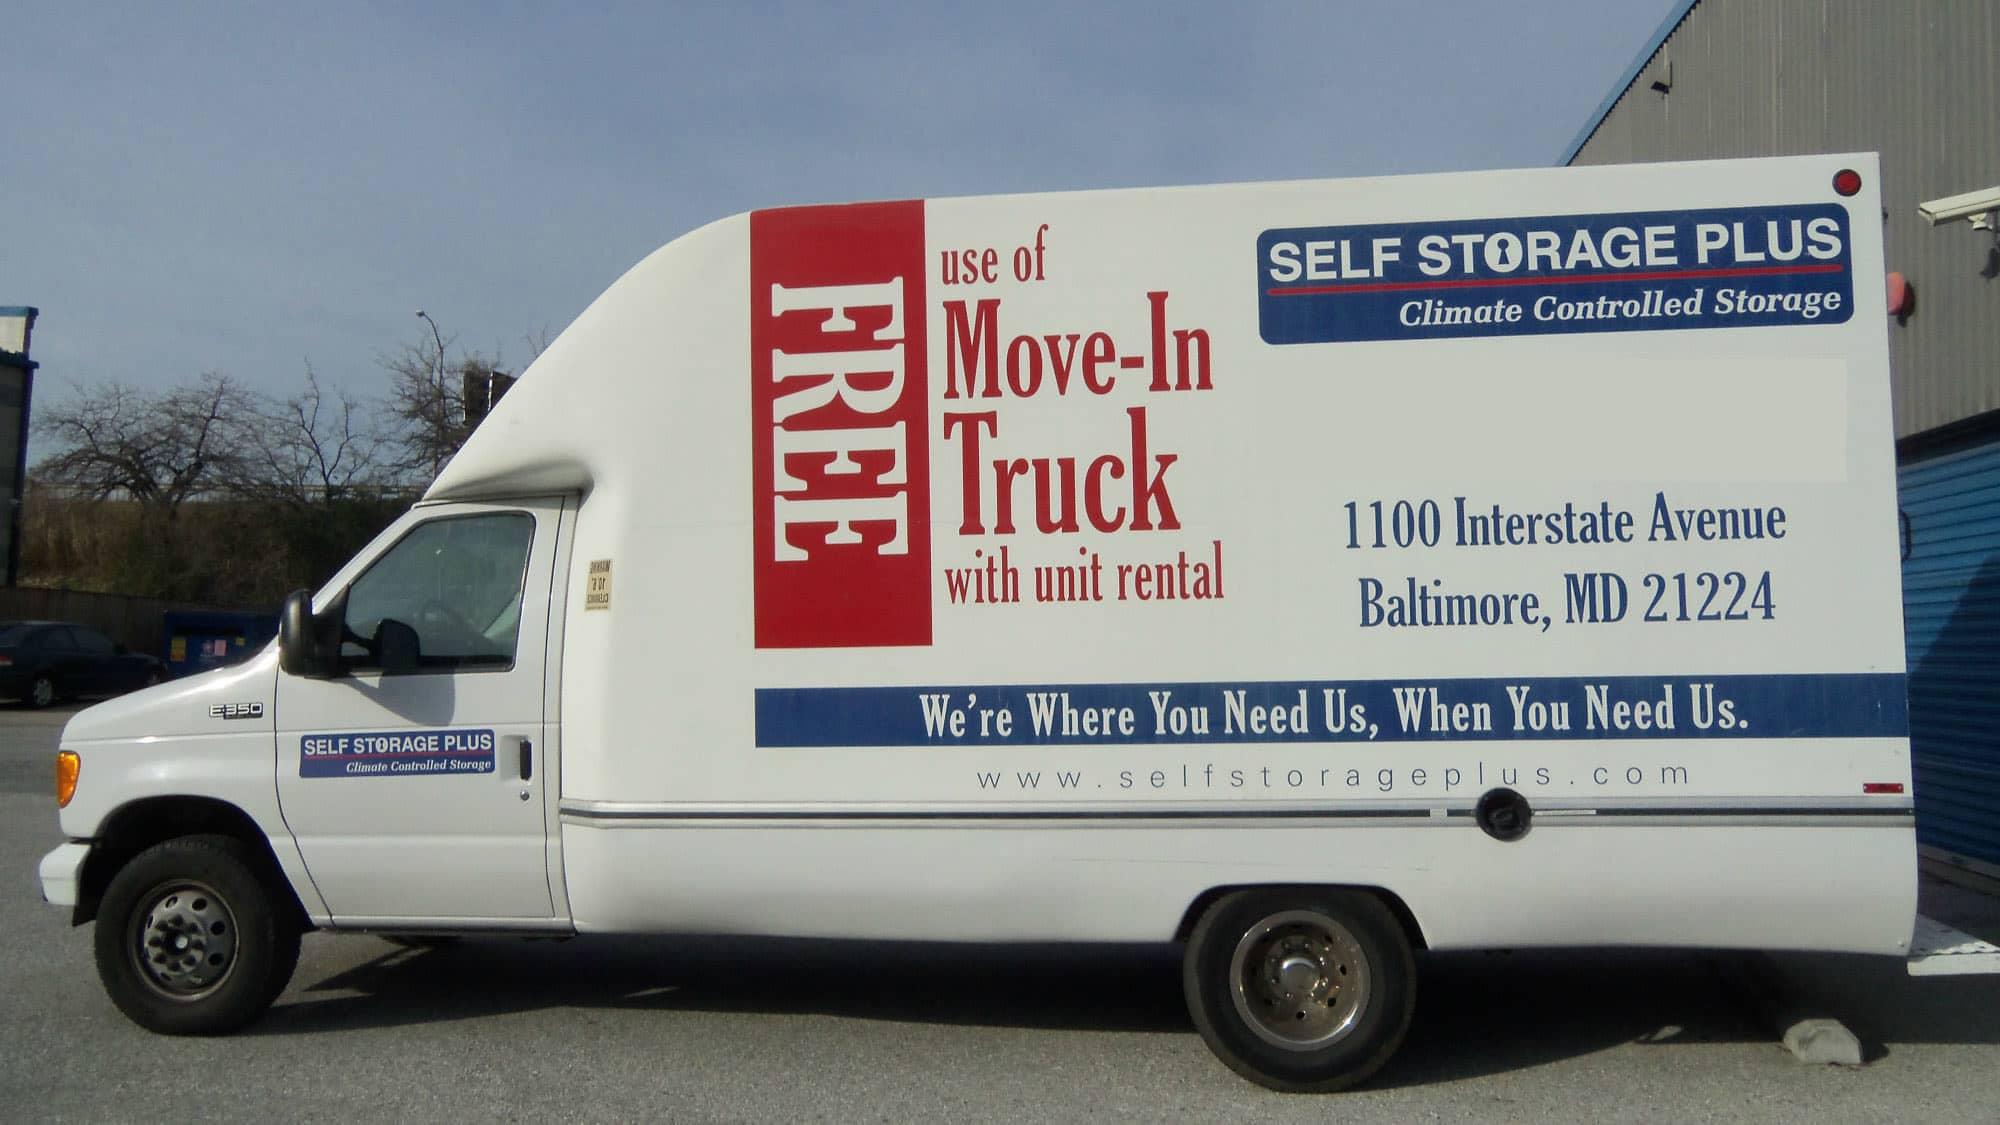 Moving van at Self Storage Plus in Baltimore, MD